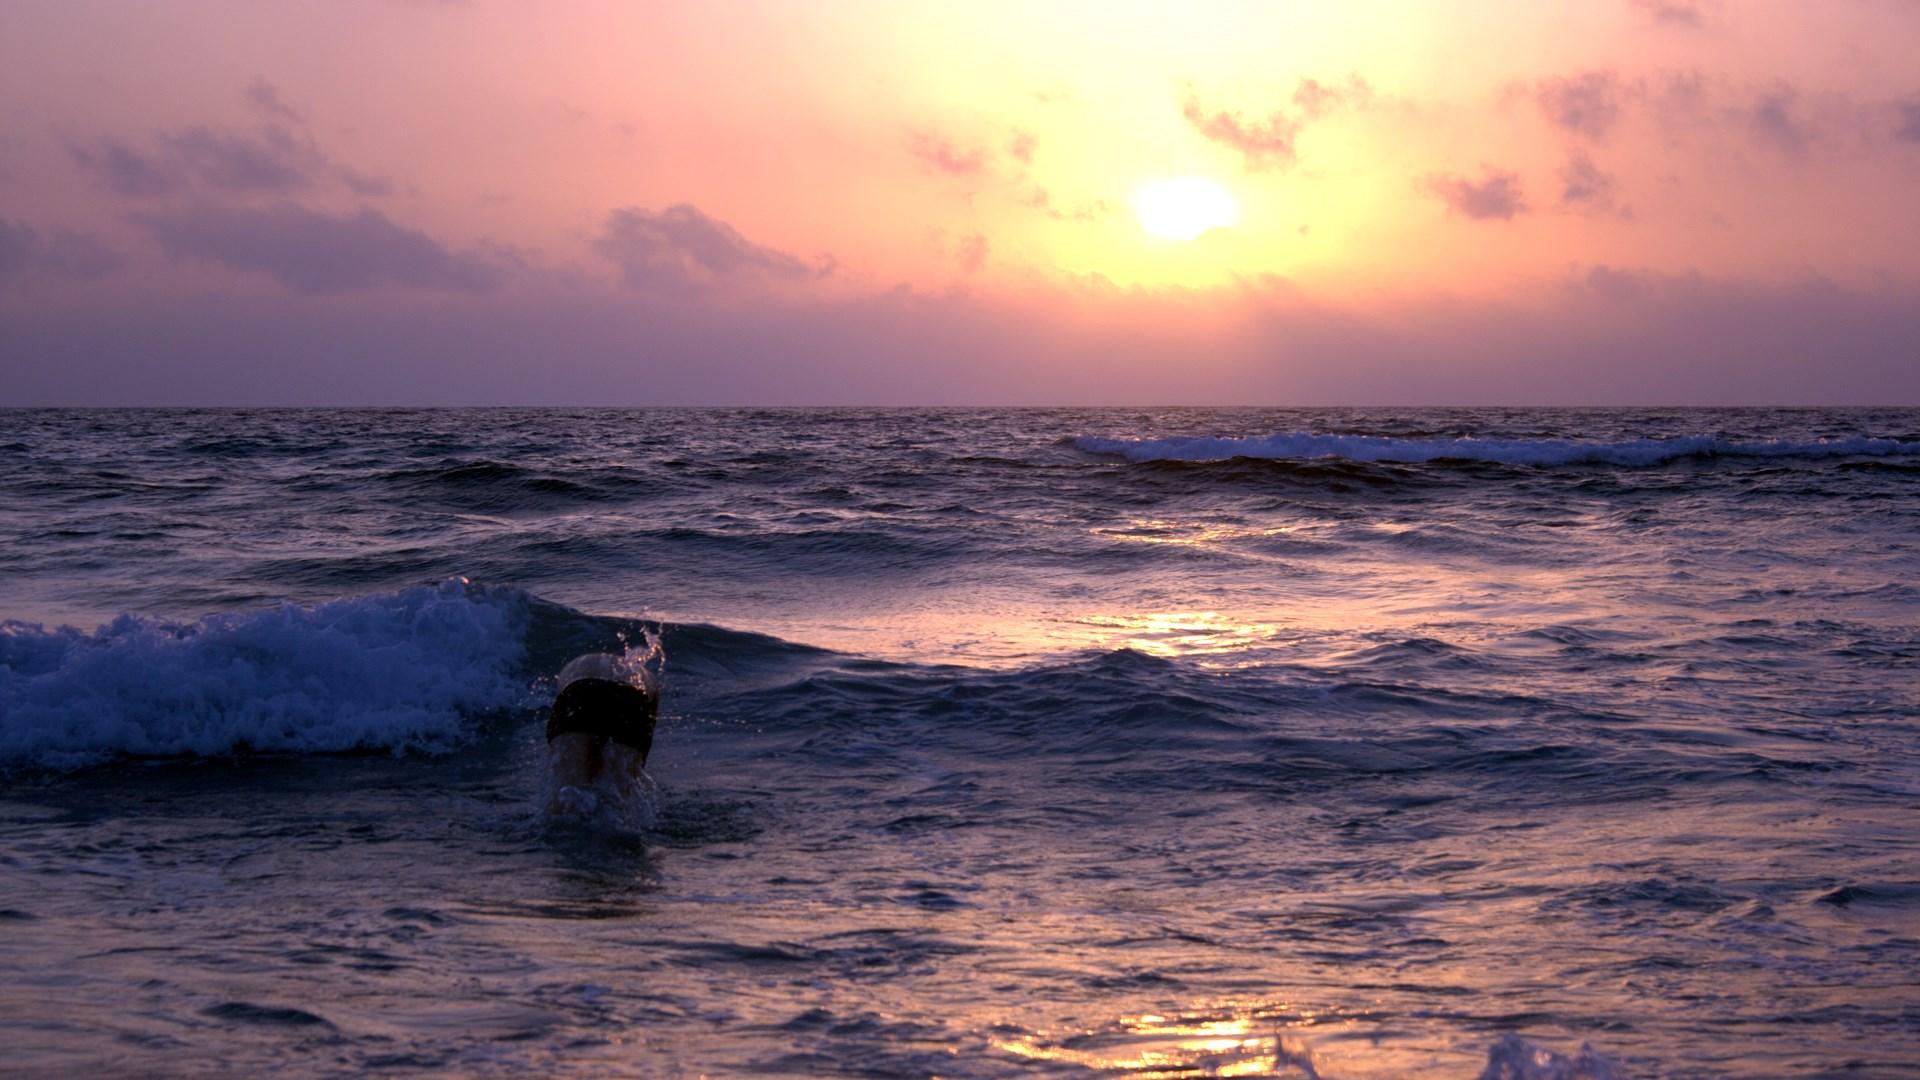 Falasarna Beach, Chania - Crete | 15 Aug 2014  | Alargo